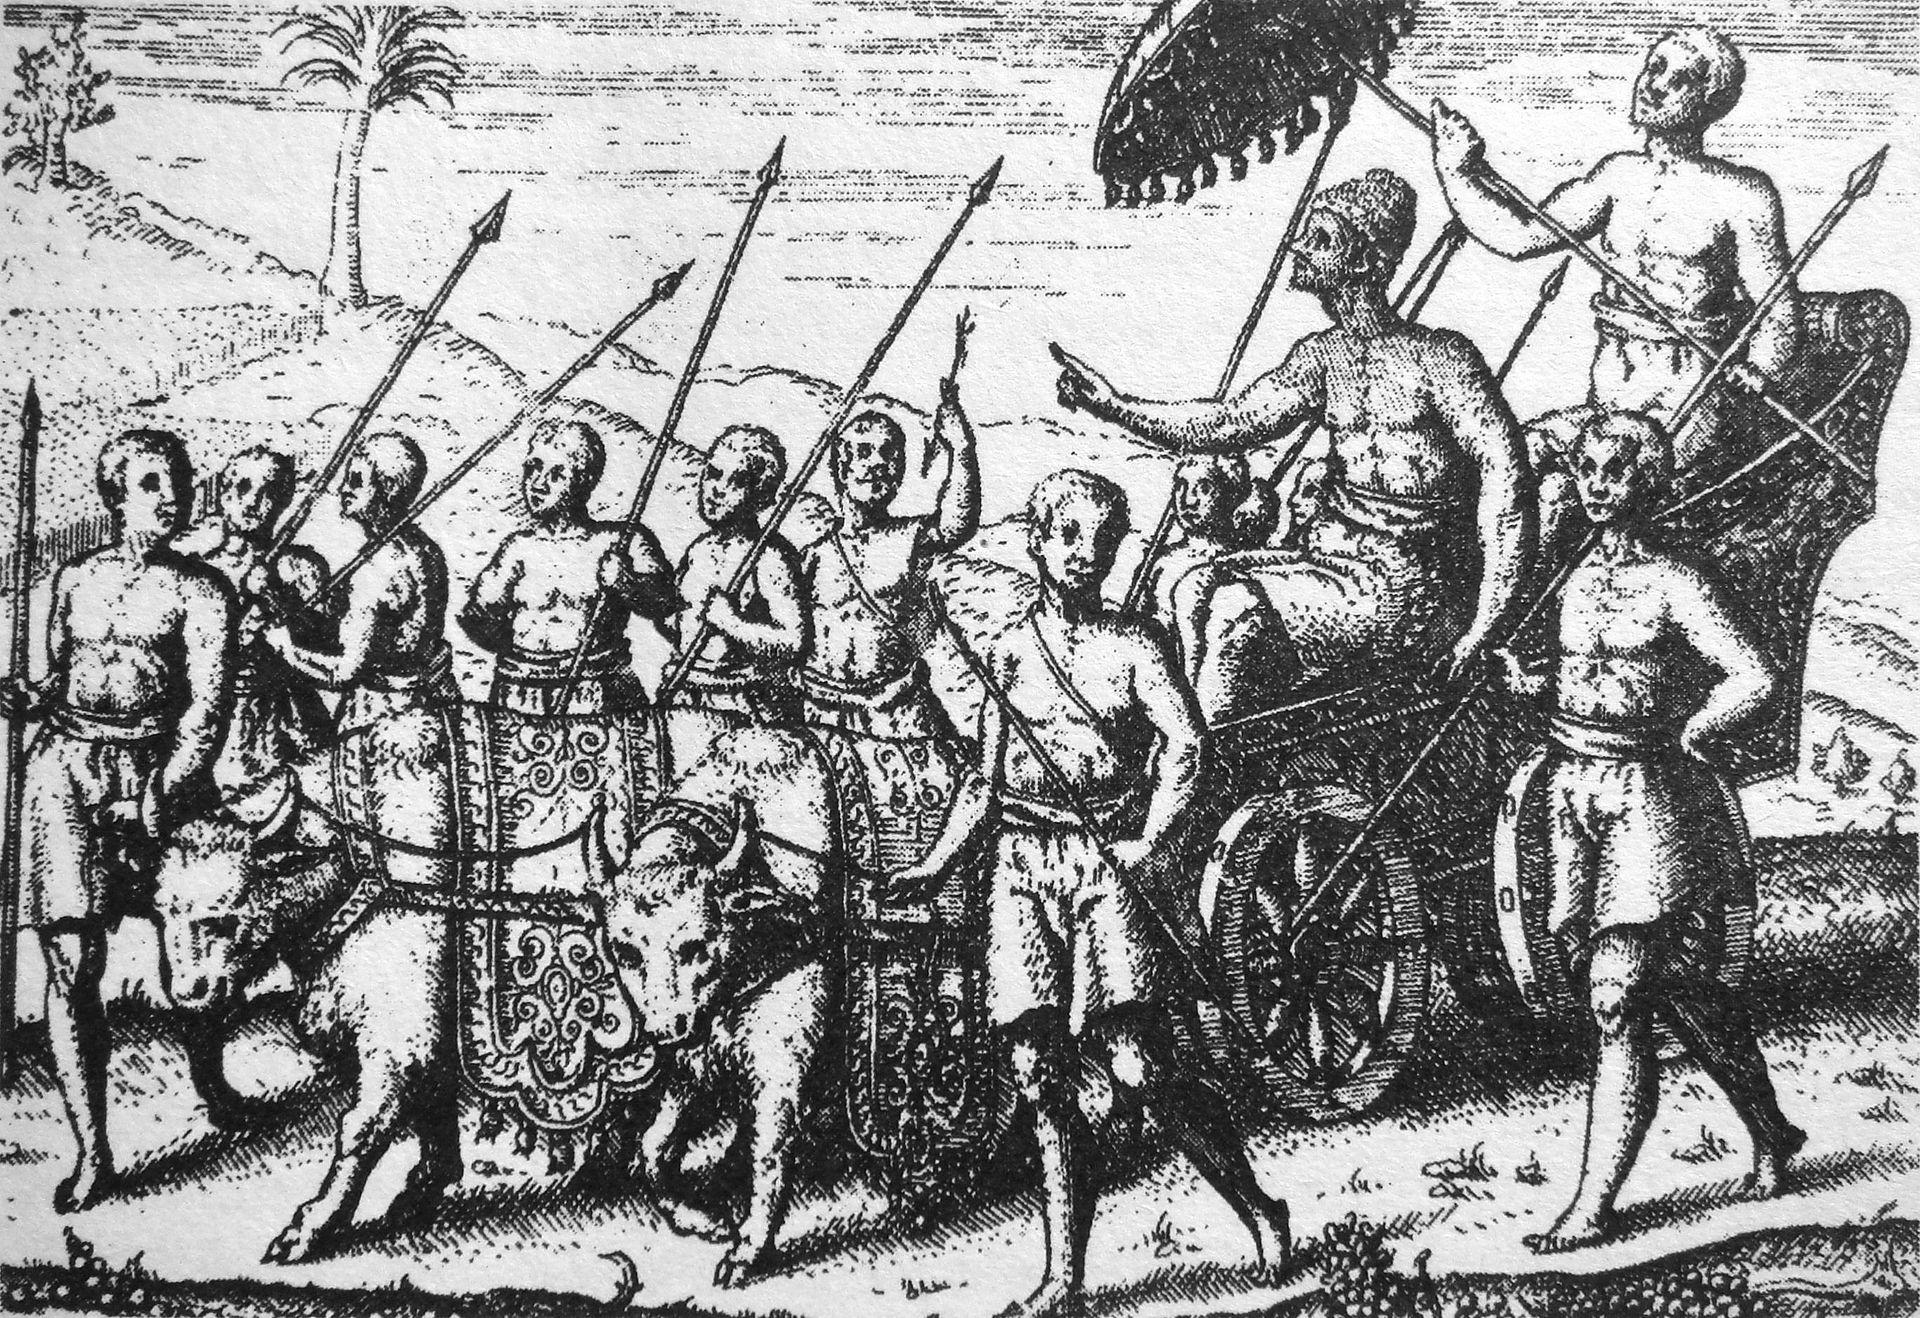 Dalem, ditarik oleh dua ekor kerbau putih. raja bali. kerajaan Bali.